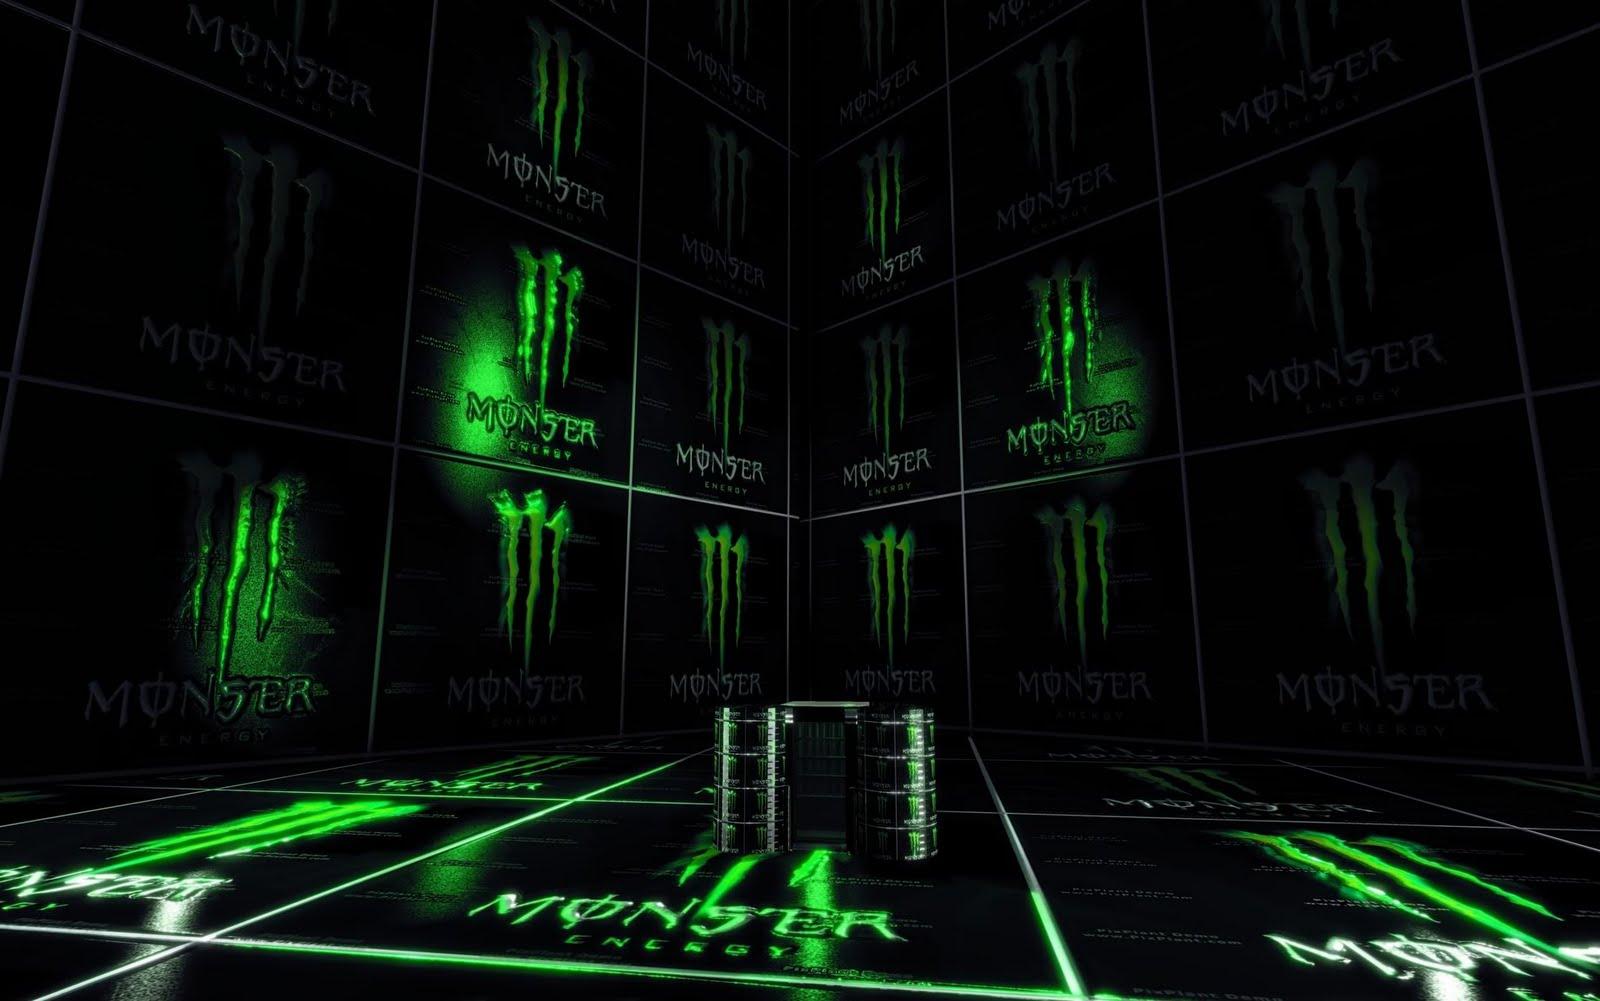 Monster energy live wallpaper wallpapersafari live video youtub monster energy cup wallpapers here 1600x1001 voltagebd Images